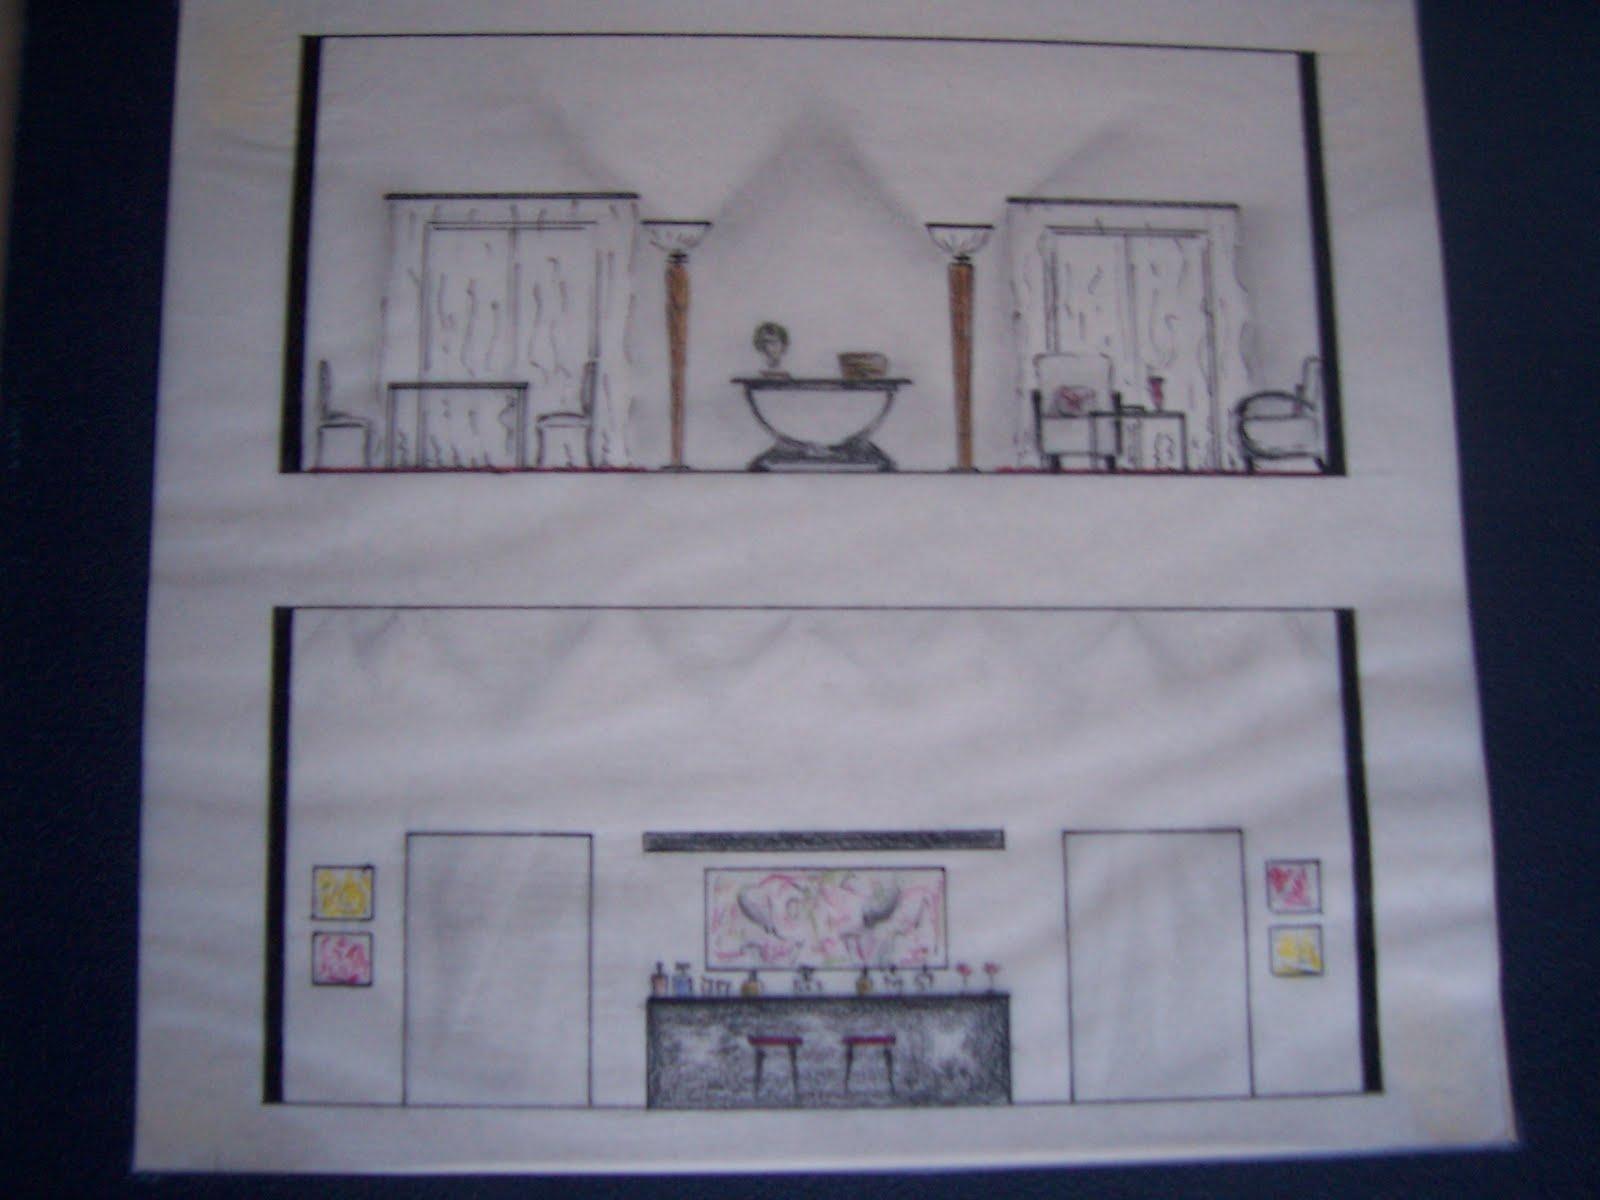 Dise o de interiores y decoracion patty temes plano for Diseno de interiores nota de corte